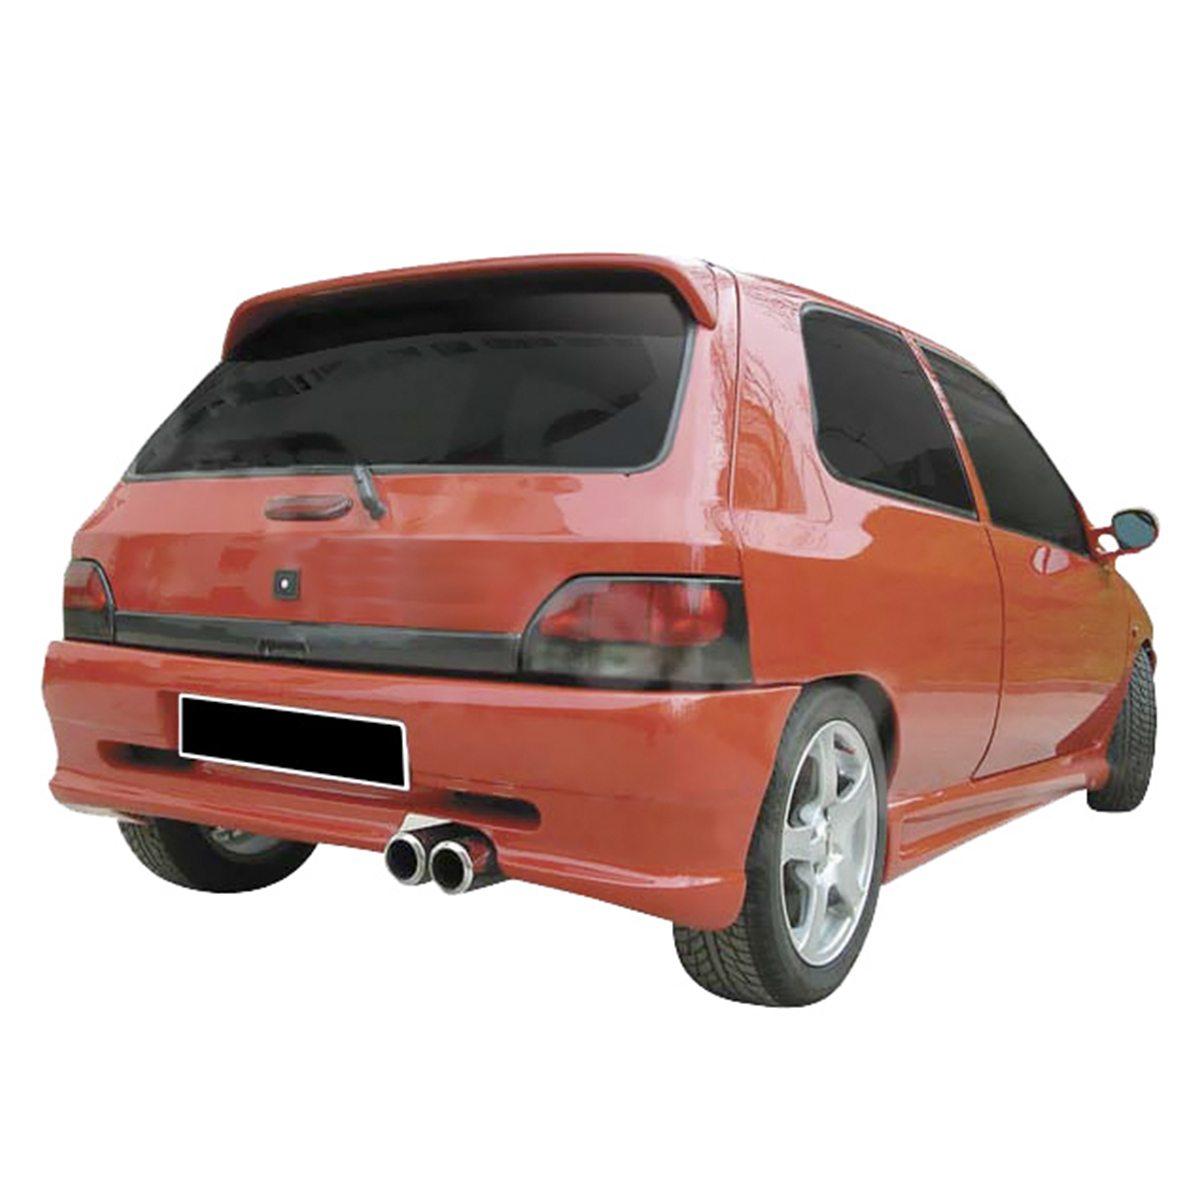 Renault-Clio-92-Sport-Tras-PCU0793